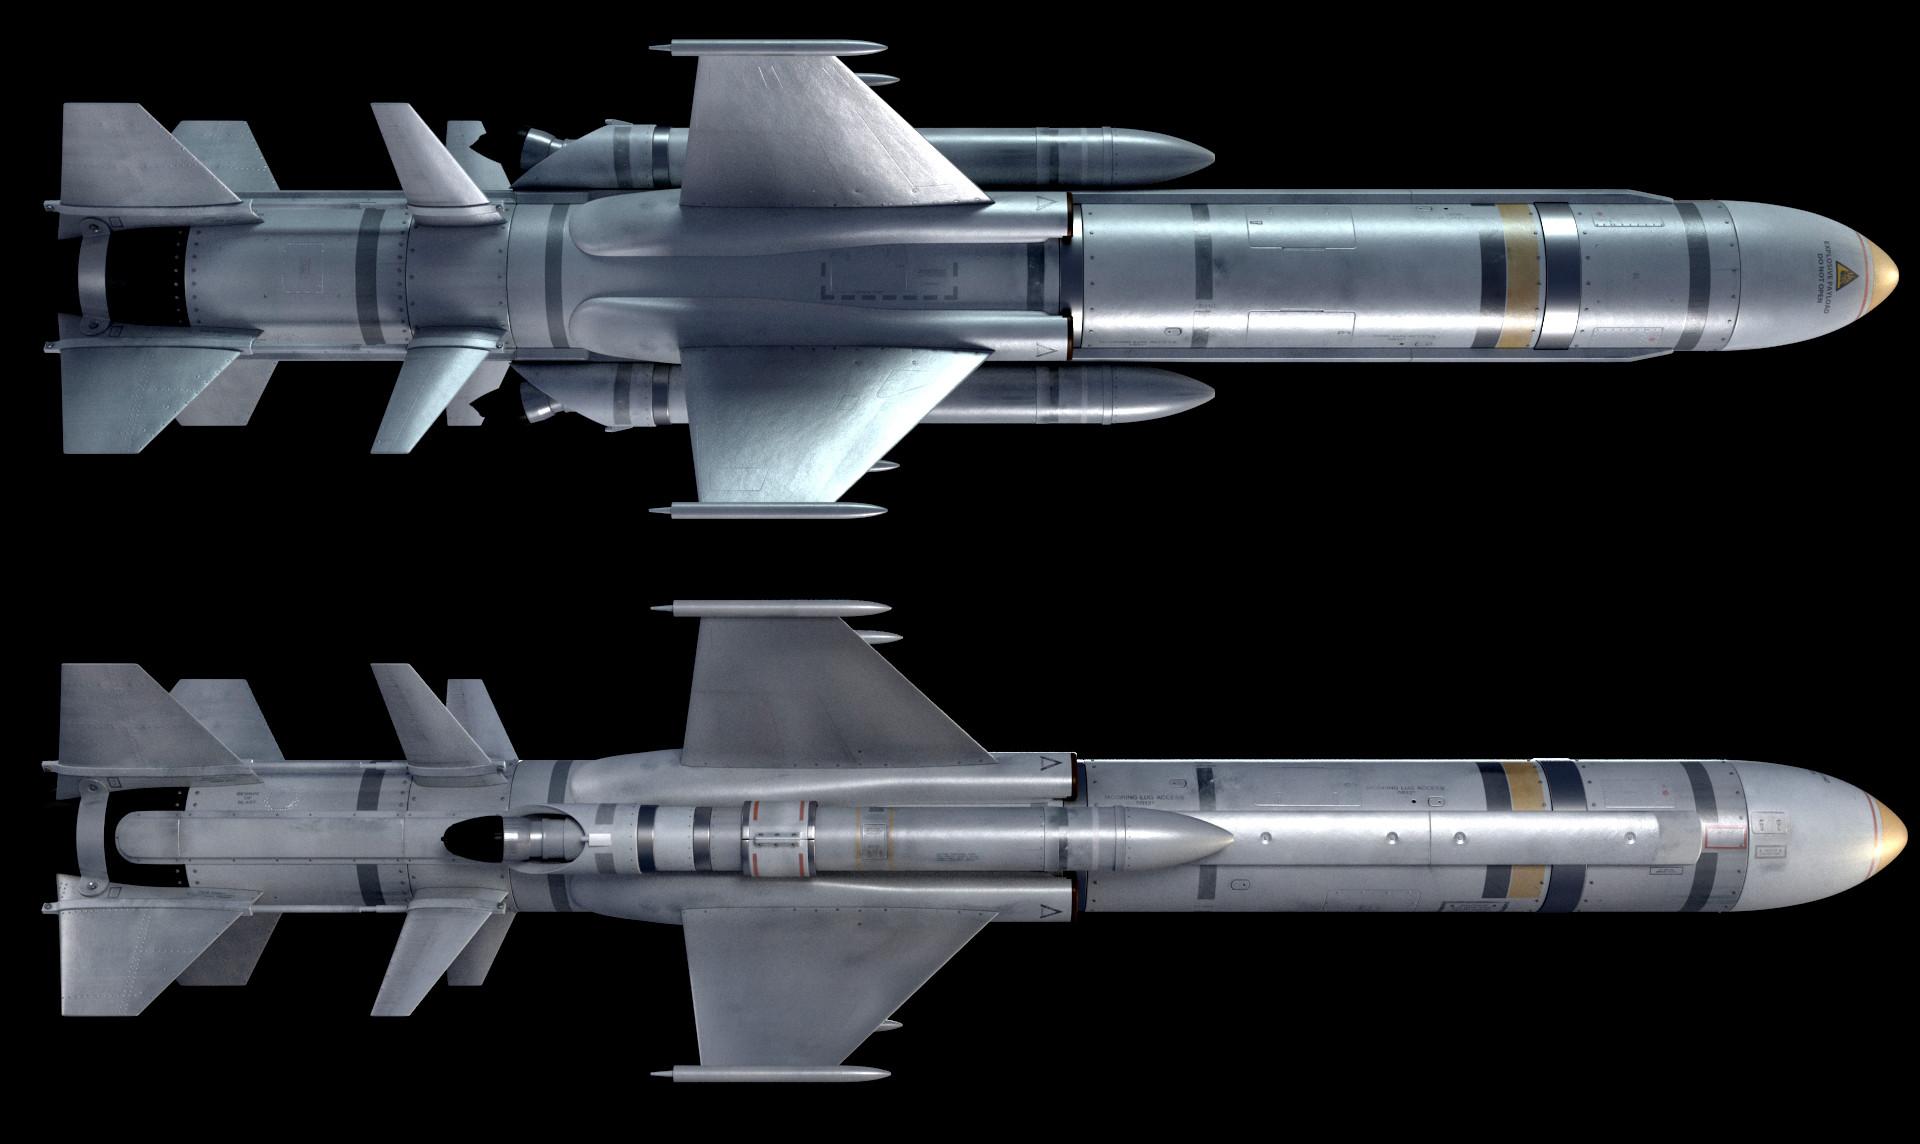 Yoshi vu missile 002